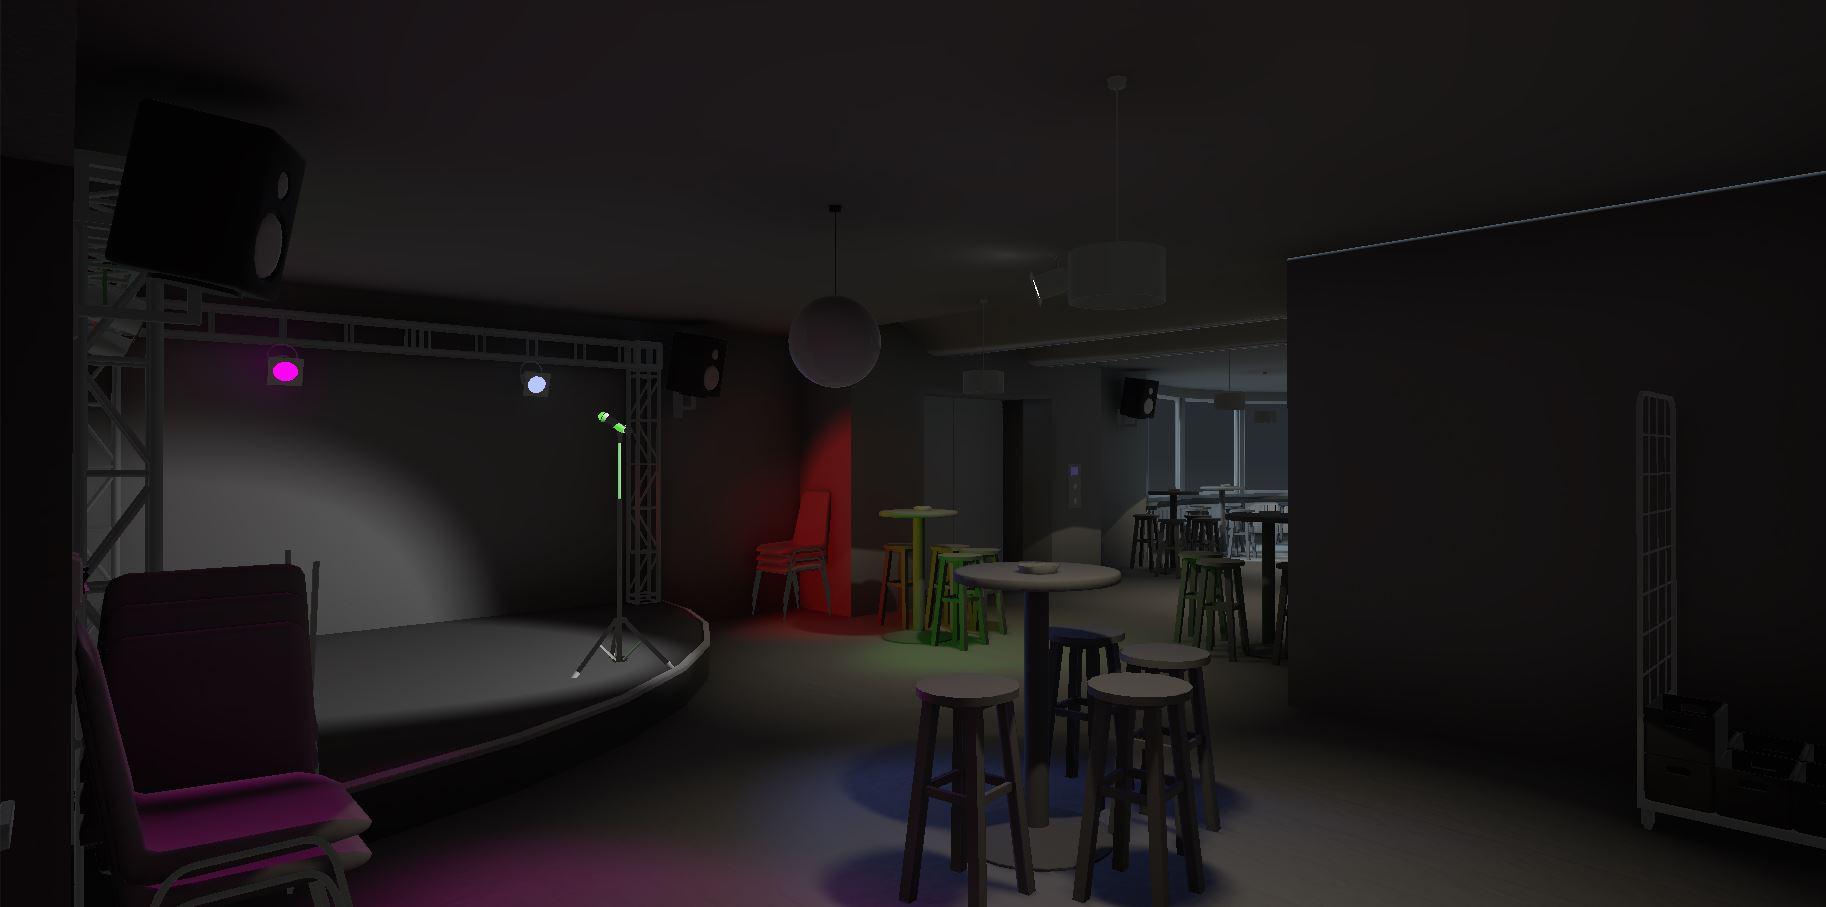 Student bar 5